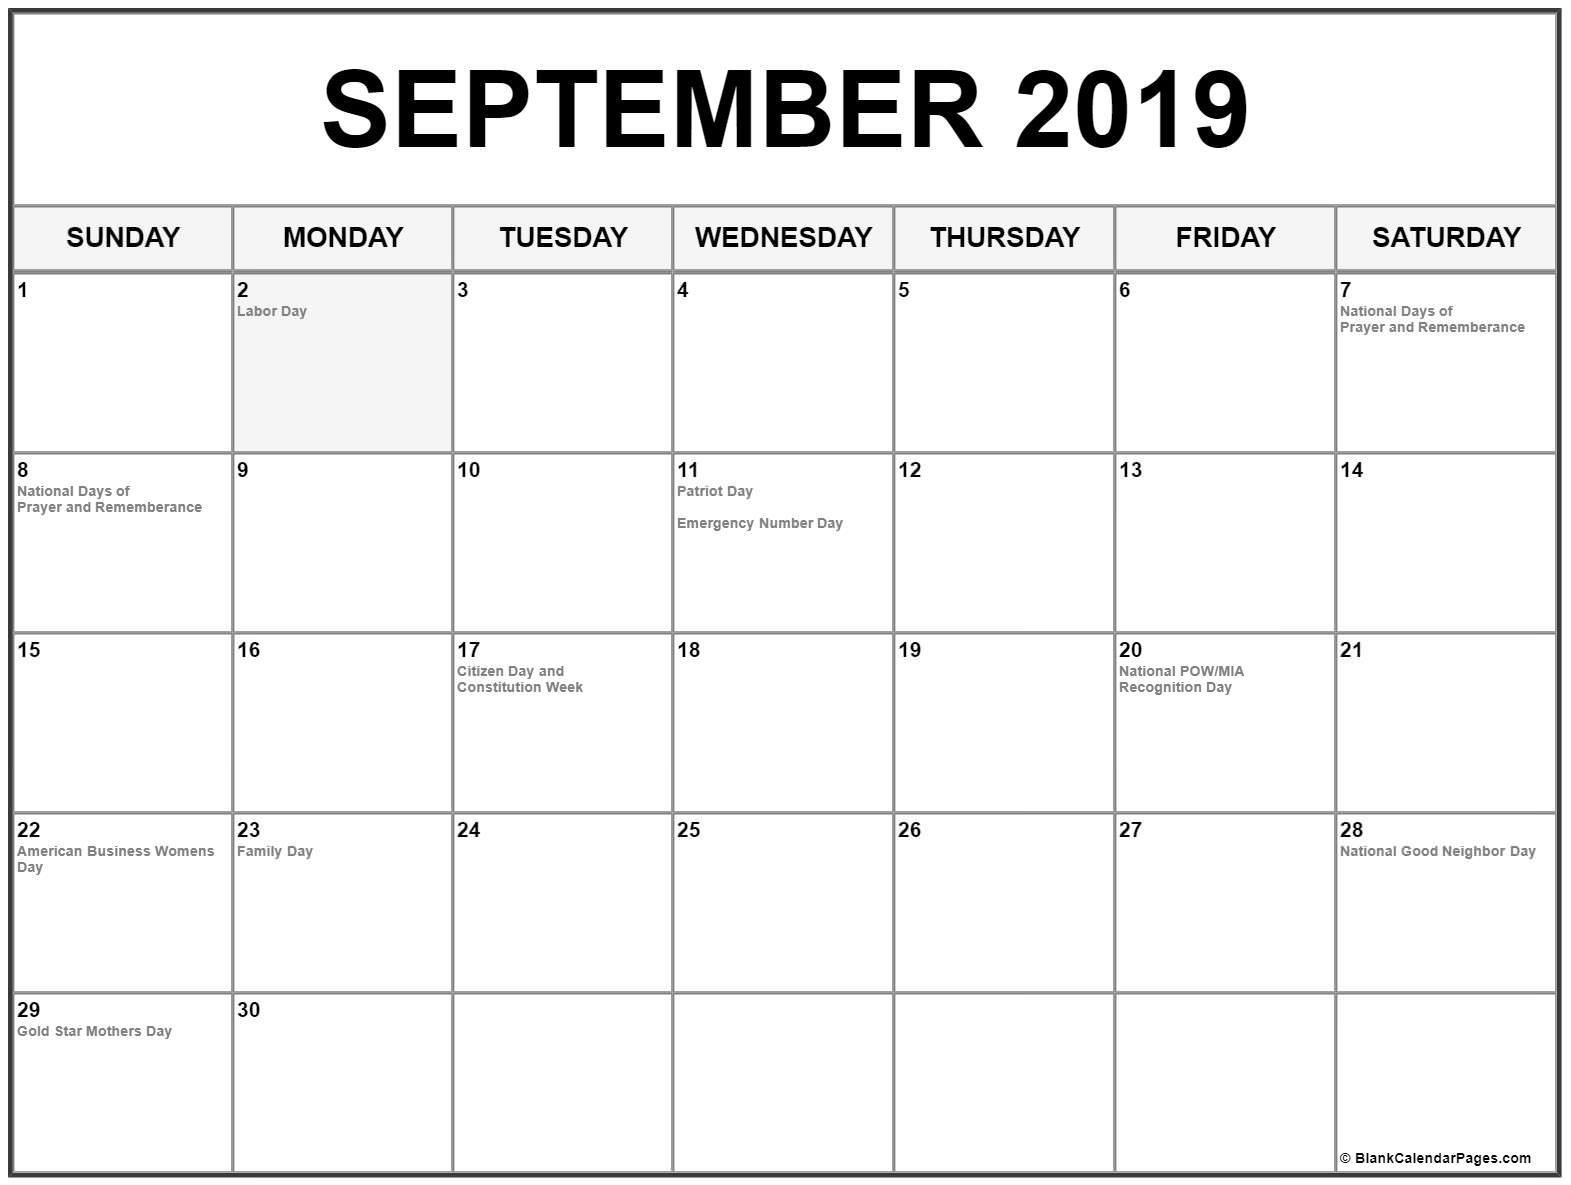 September 2019 Calendar With Holidays September 2019 Calendar With Holidays #september #september2019